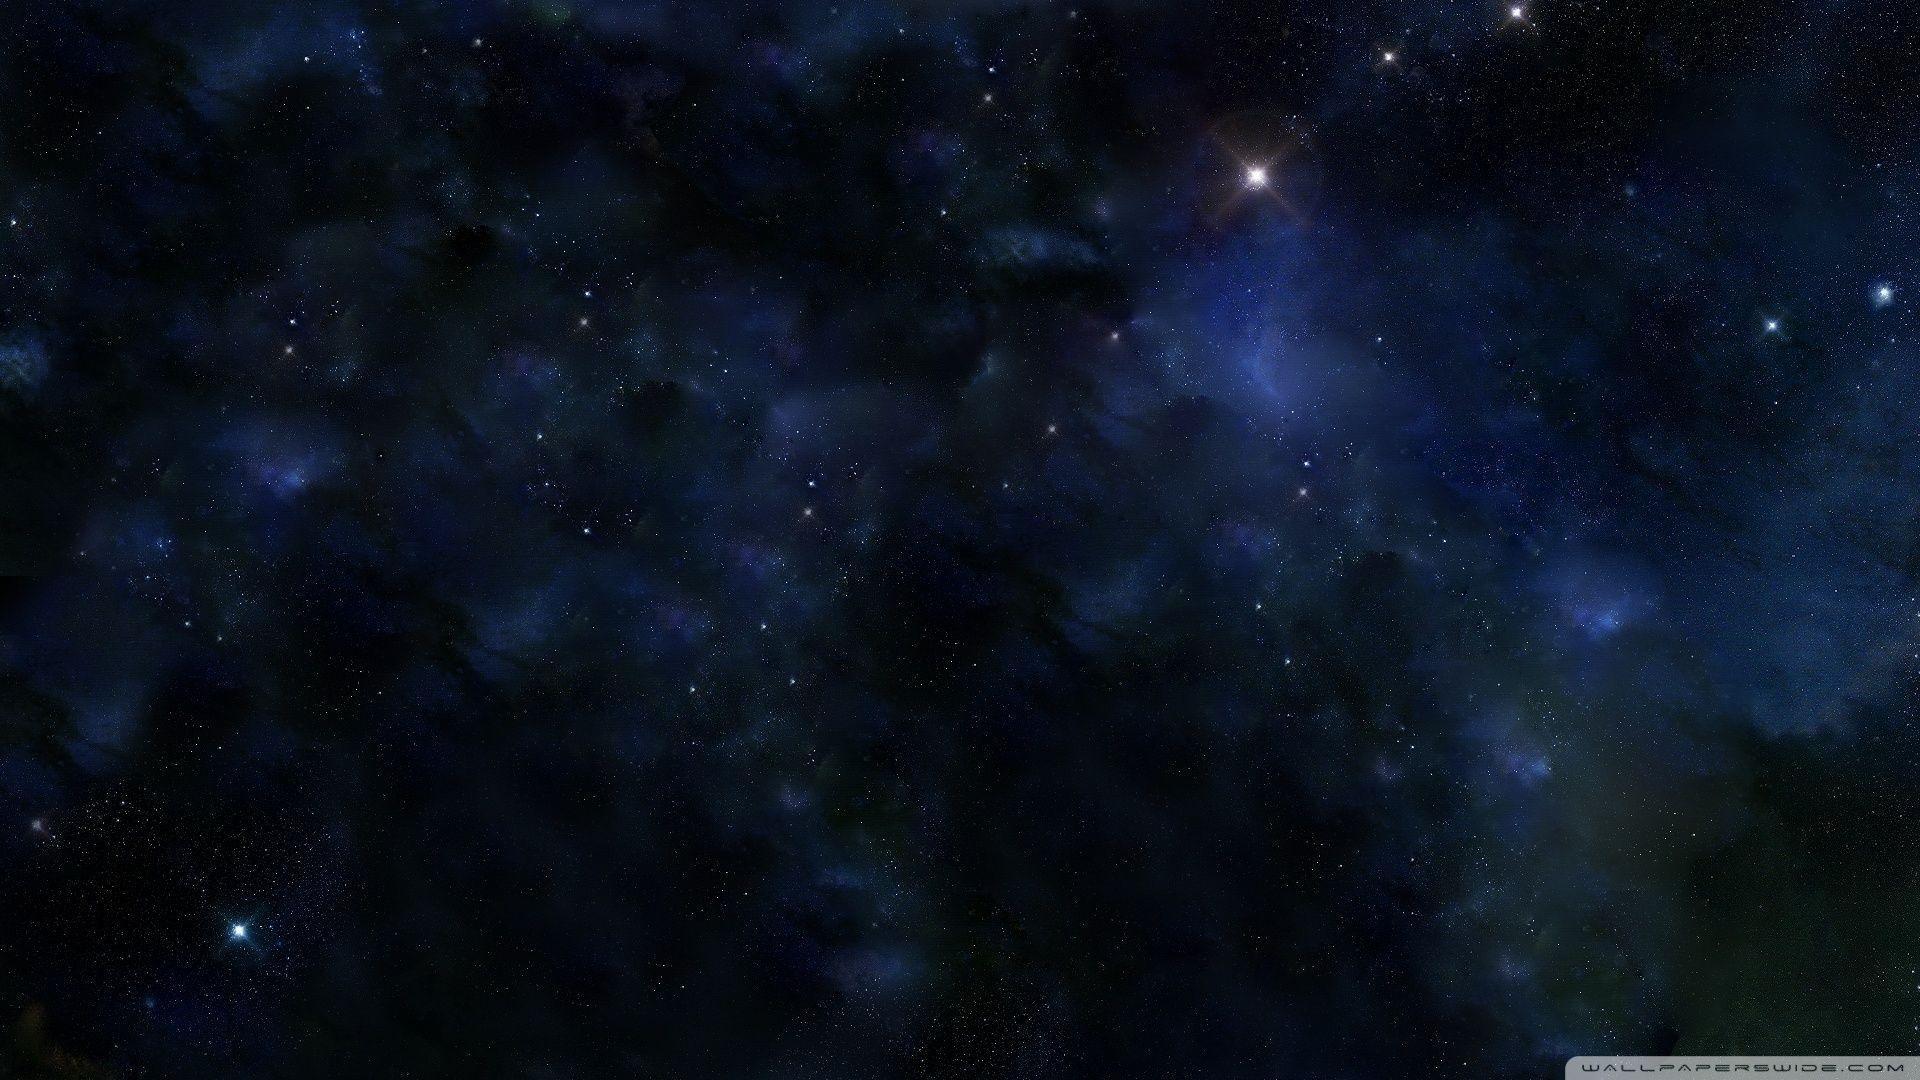 Deep Space Wallpaper 1920x1080 66 Images